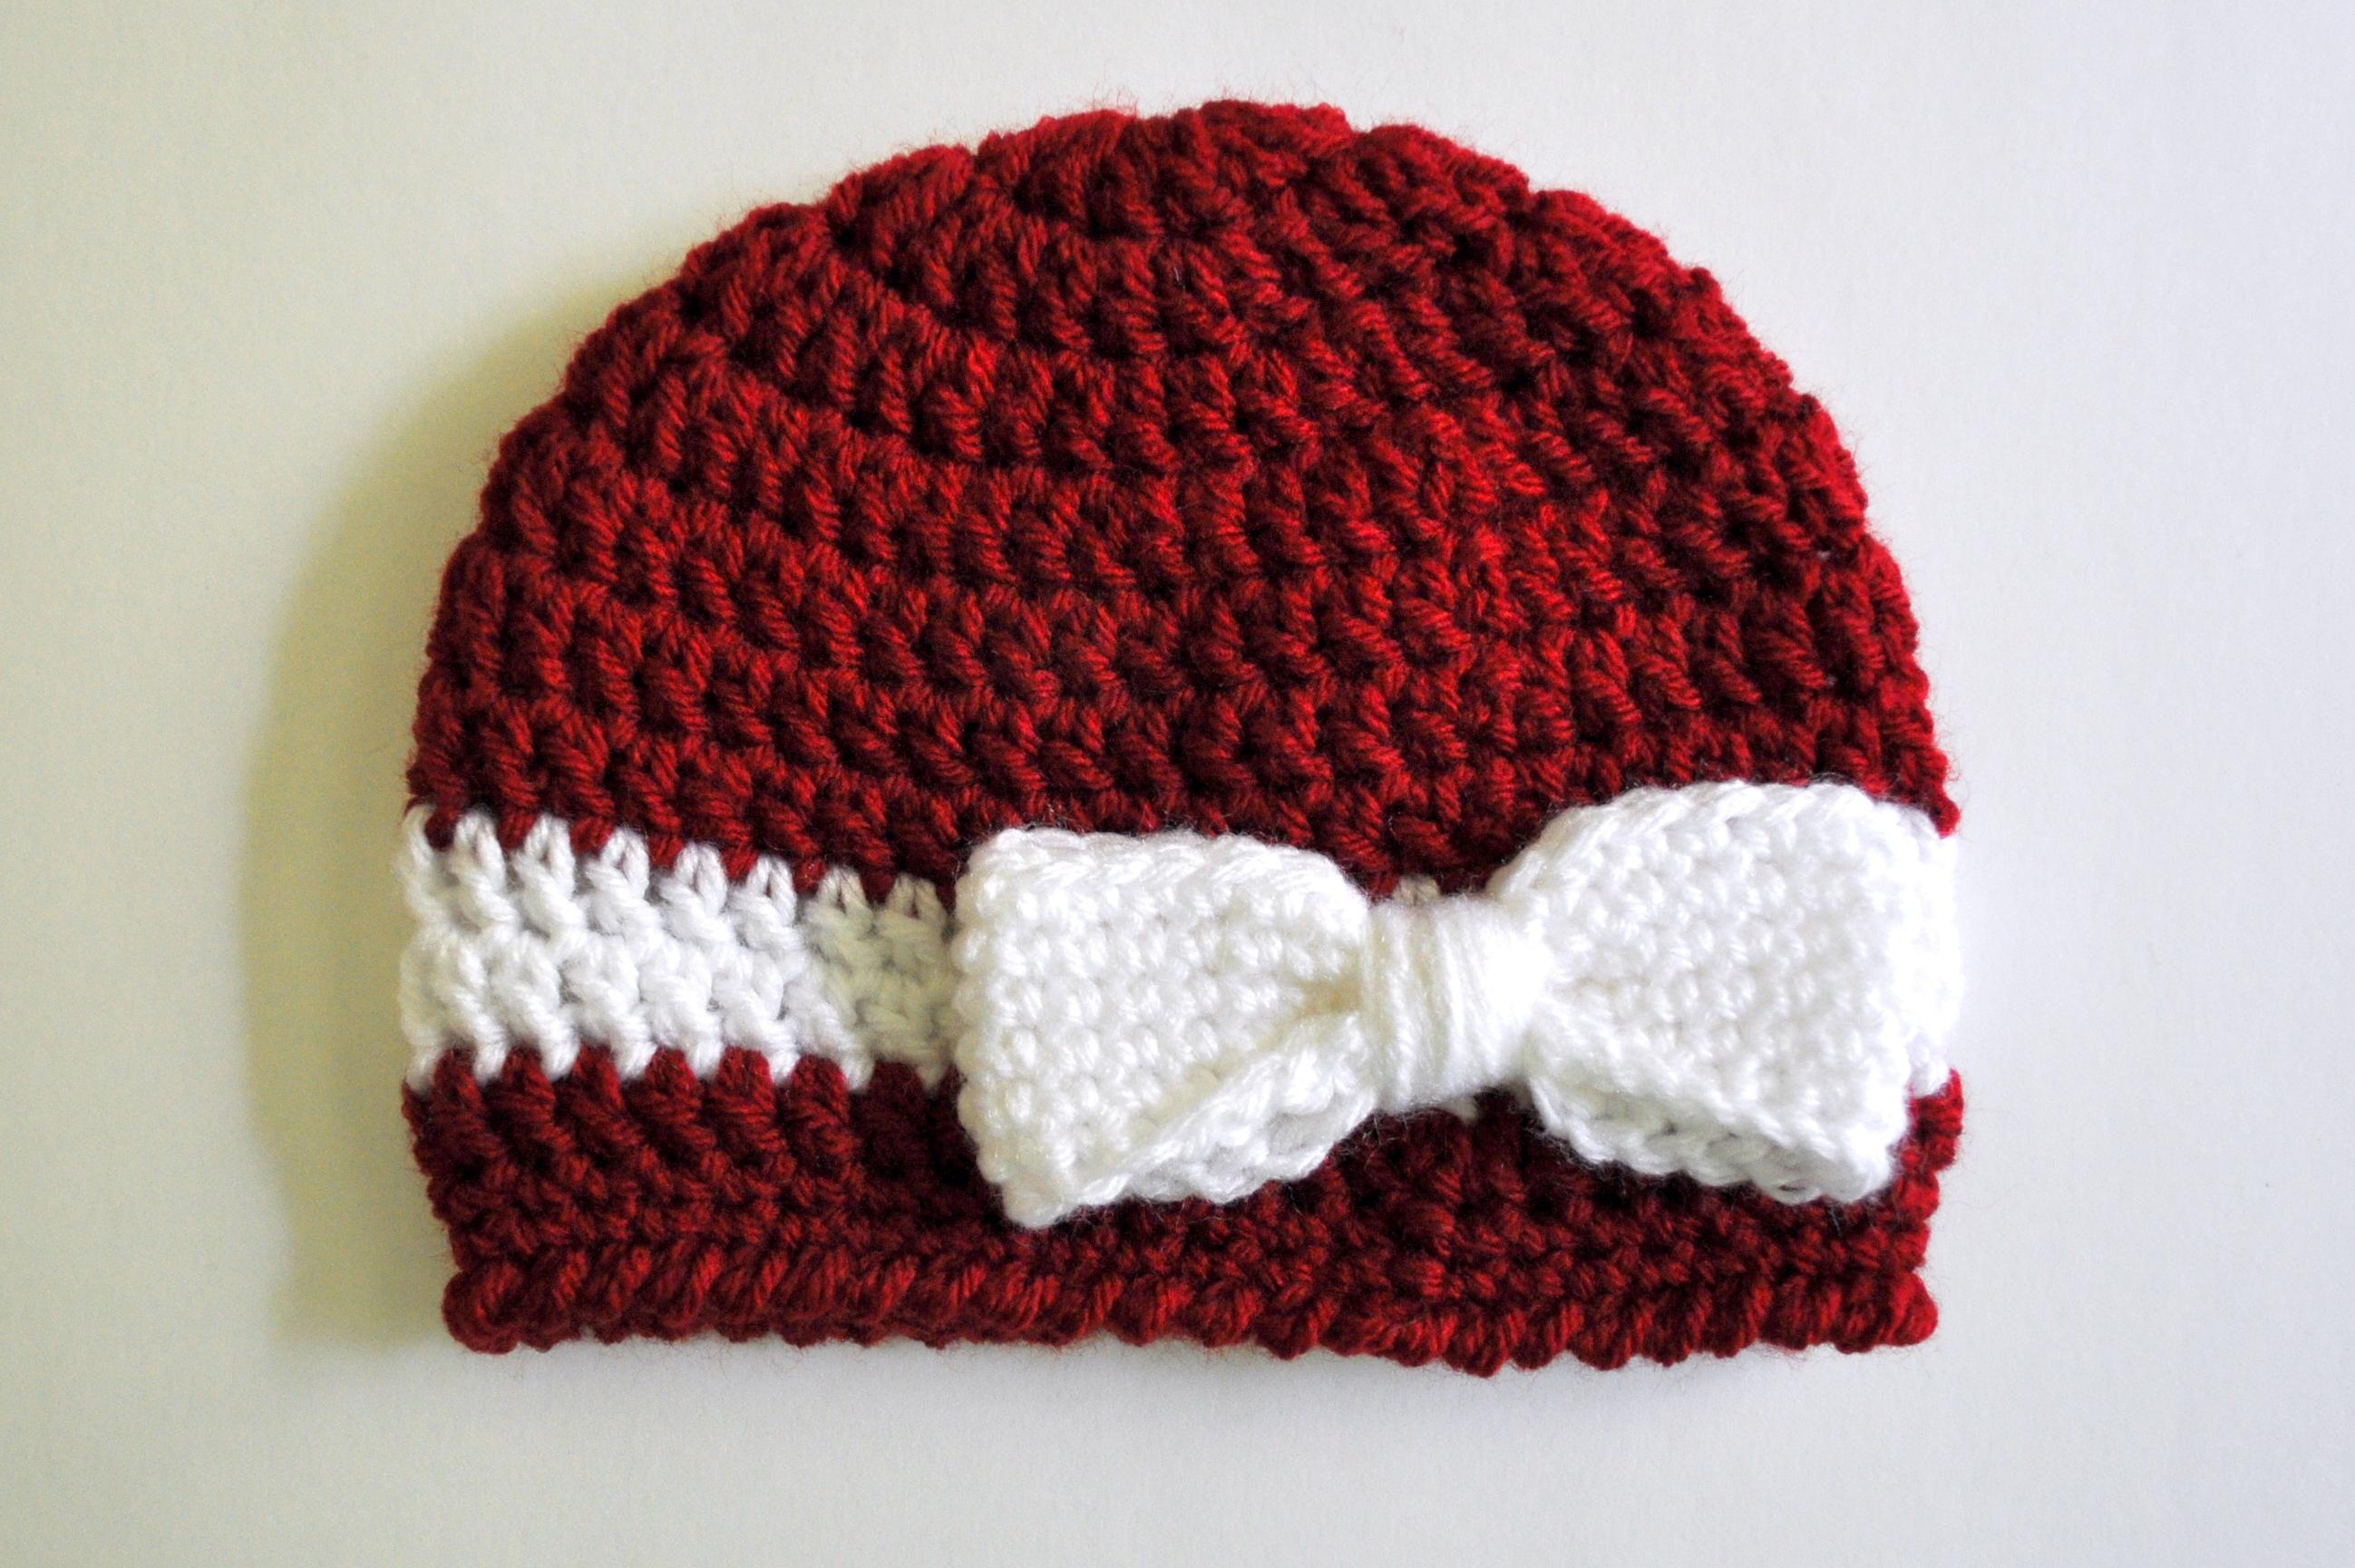 Crochet Infant Hat Patterns Free Pattern Crochet Bow And Ribbon Ba Hat Classy Crochet